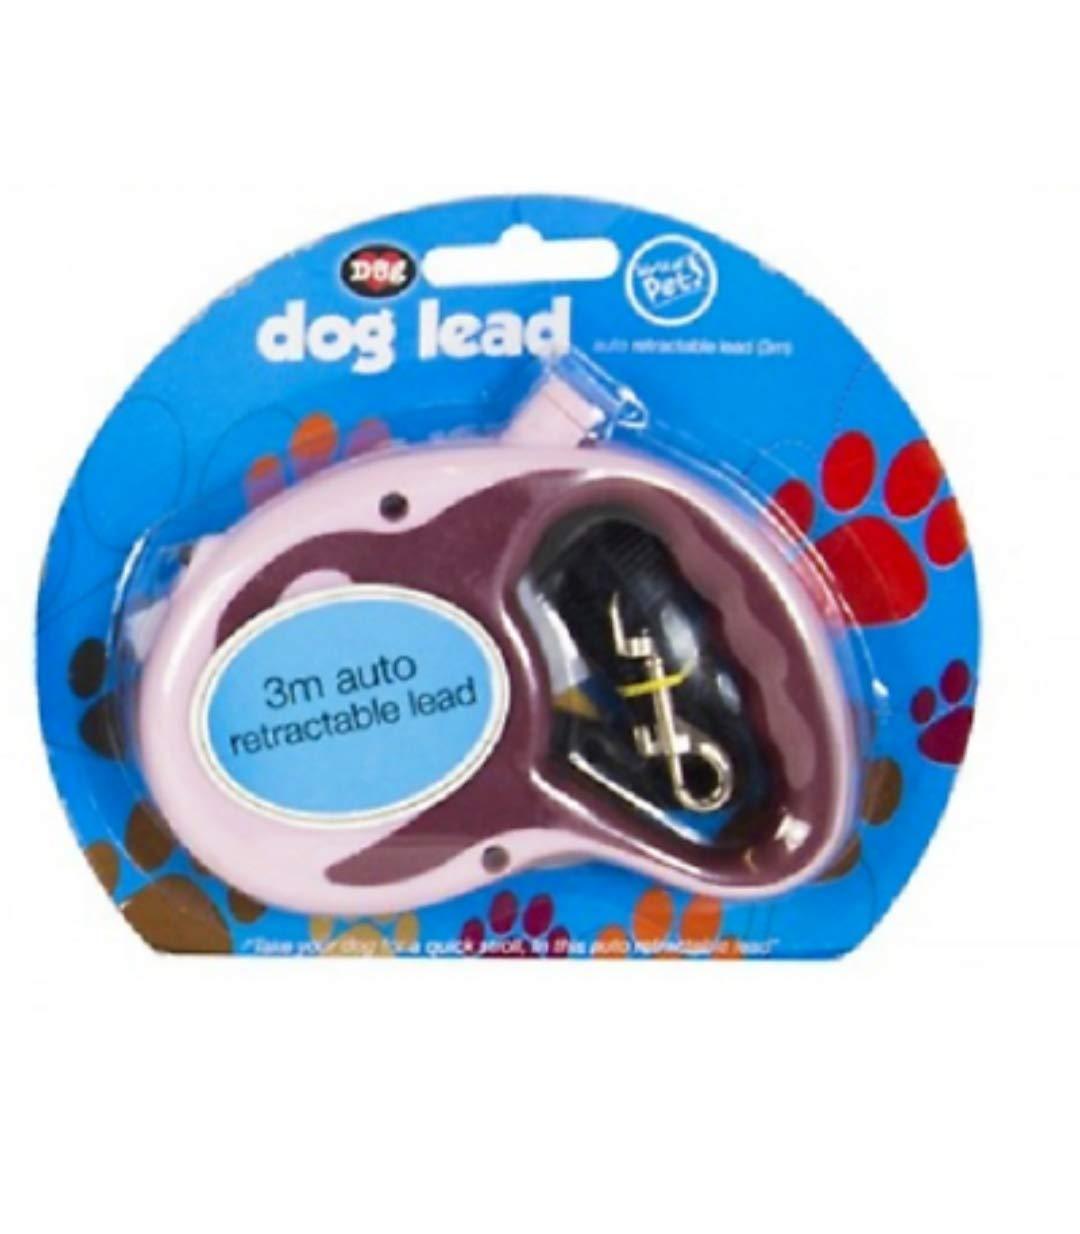 All-Pet-Solutions-Retractable-Dog-Lead-Extending-Leash-Tape-3m-5m-8m-Long-Max-50kg